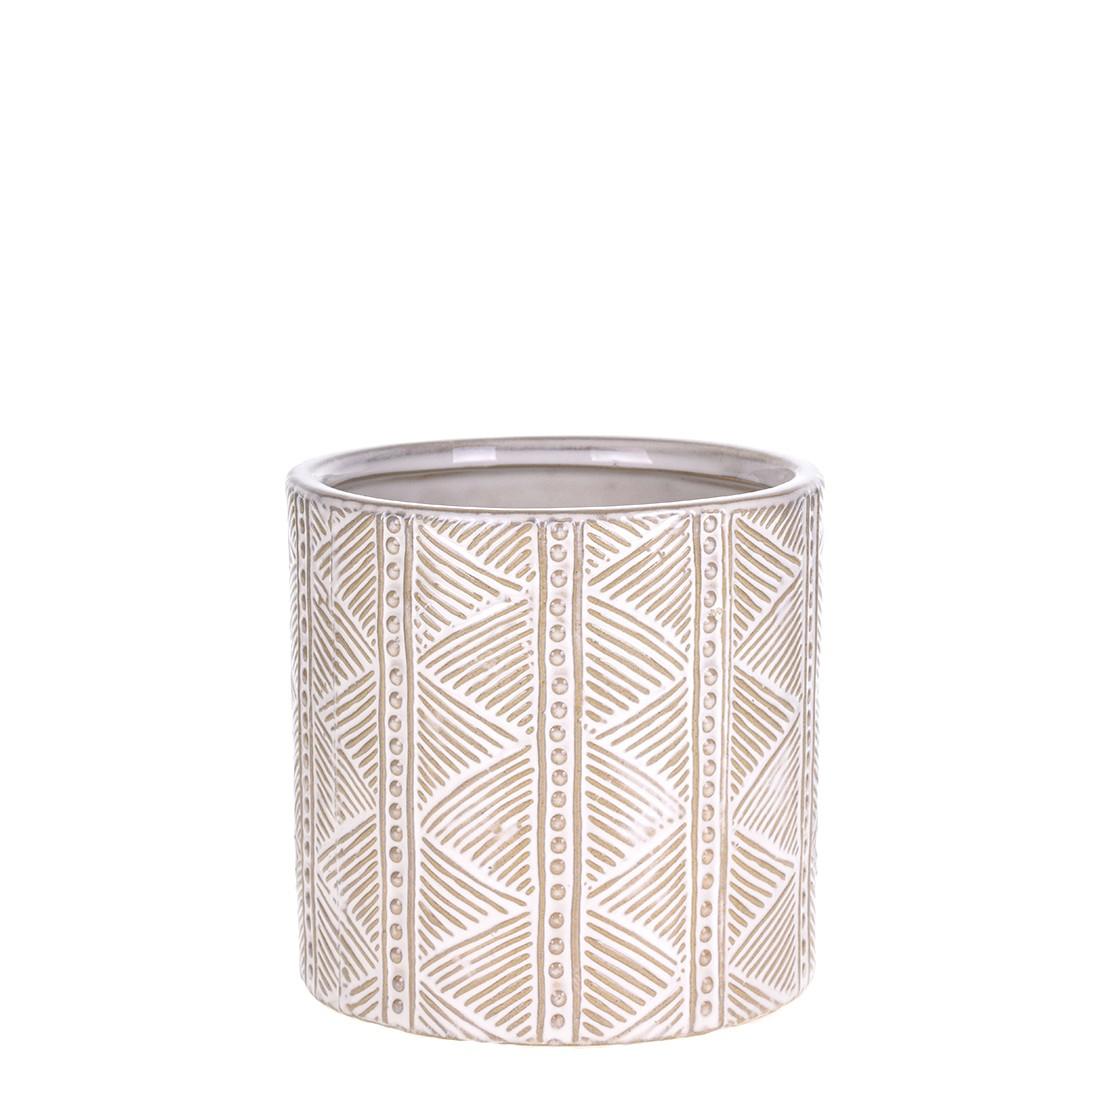 Vaso Decorativo de Ceramica Redondo Bali 13cm Asteca